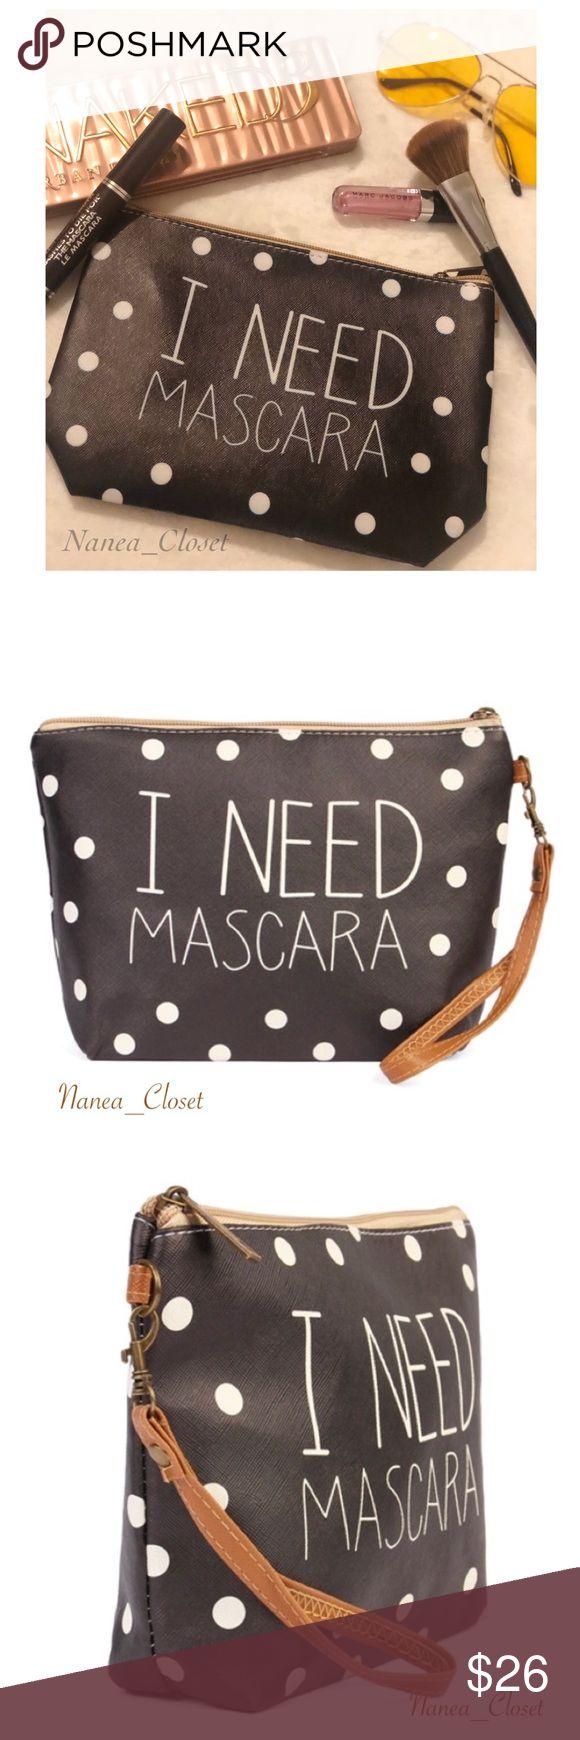 "Cosmetic Bag ""I Need Mascara"" Polka Dot Boutique Bags"